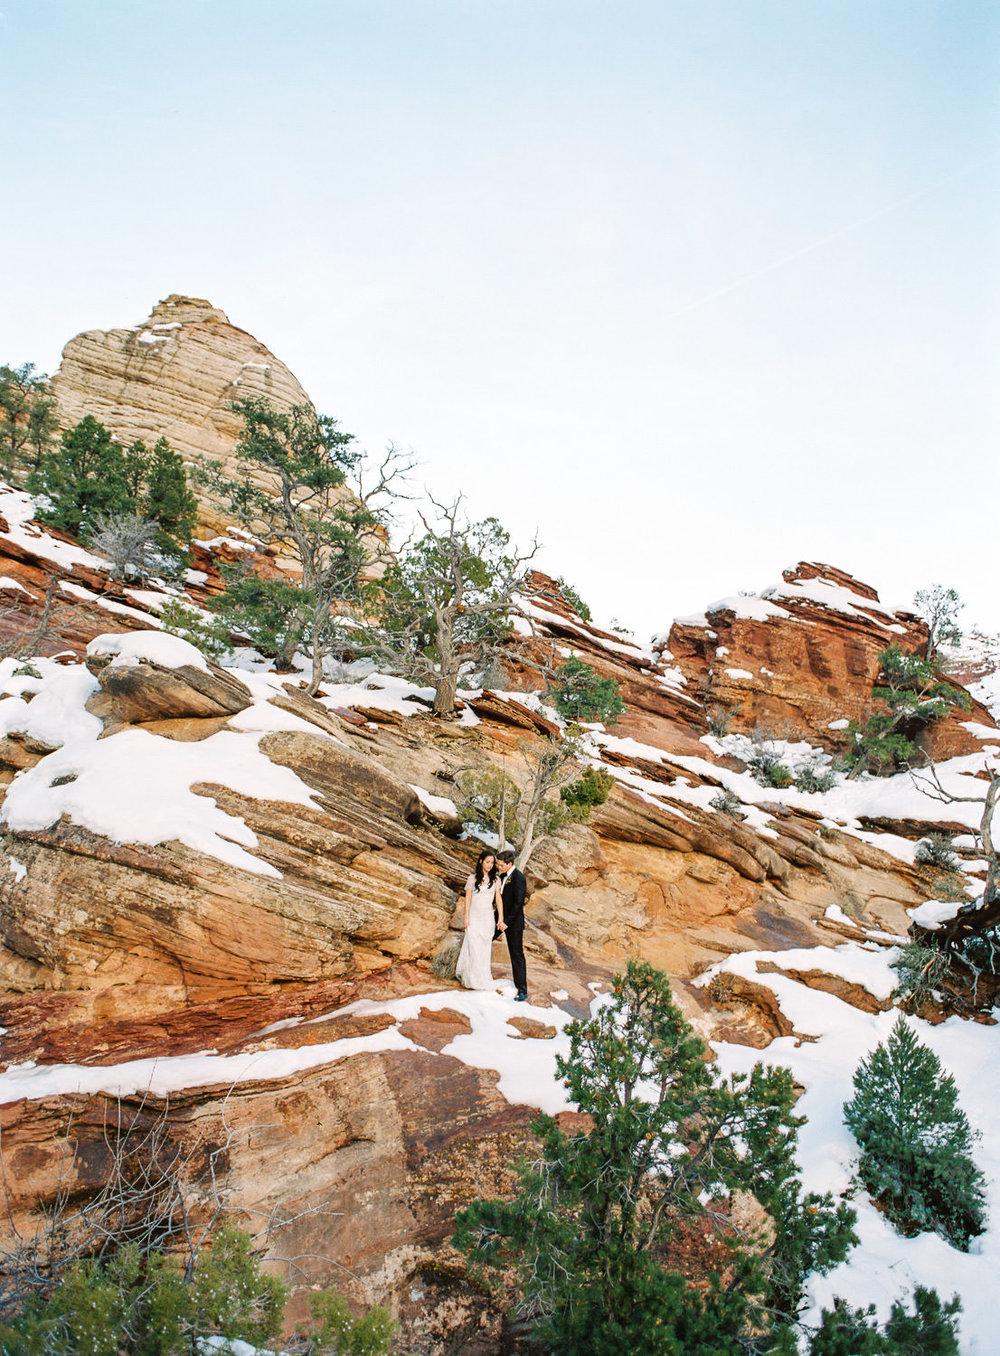 Canyon Overlook trail elopement fine art film wedding photographer Fuji 400h